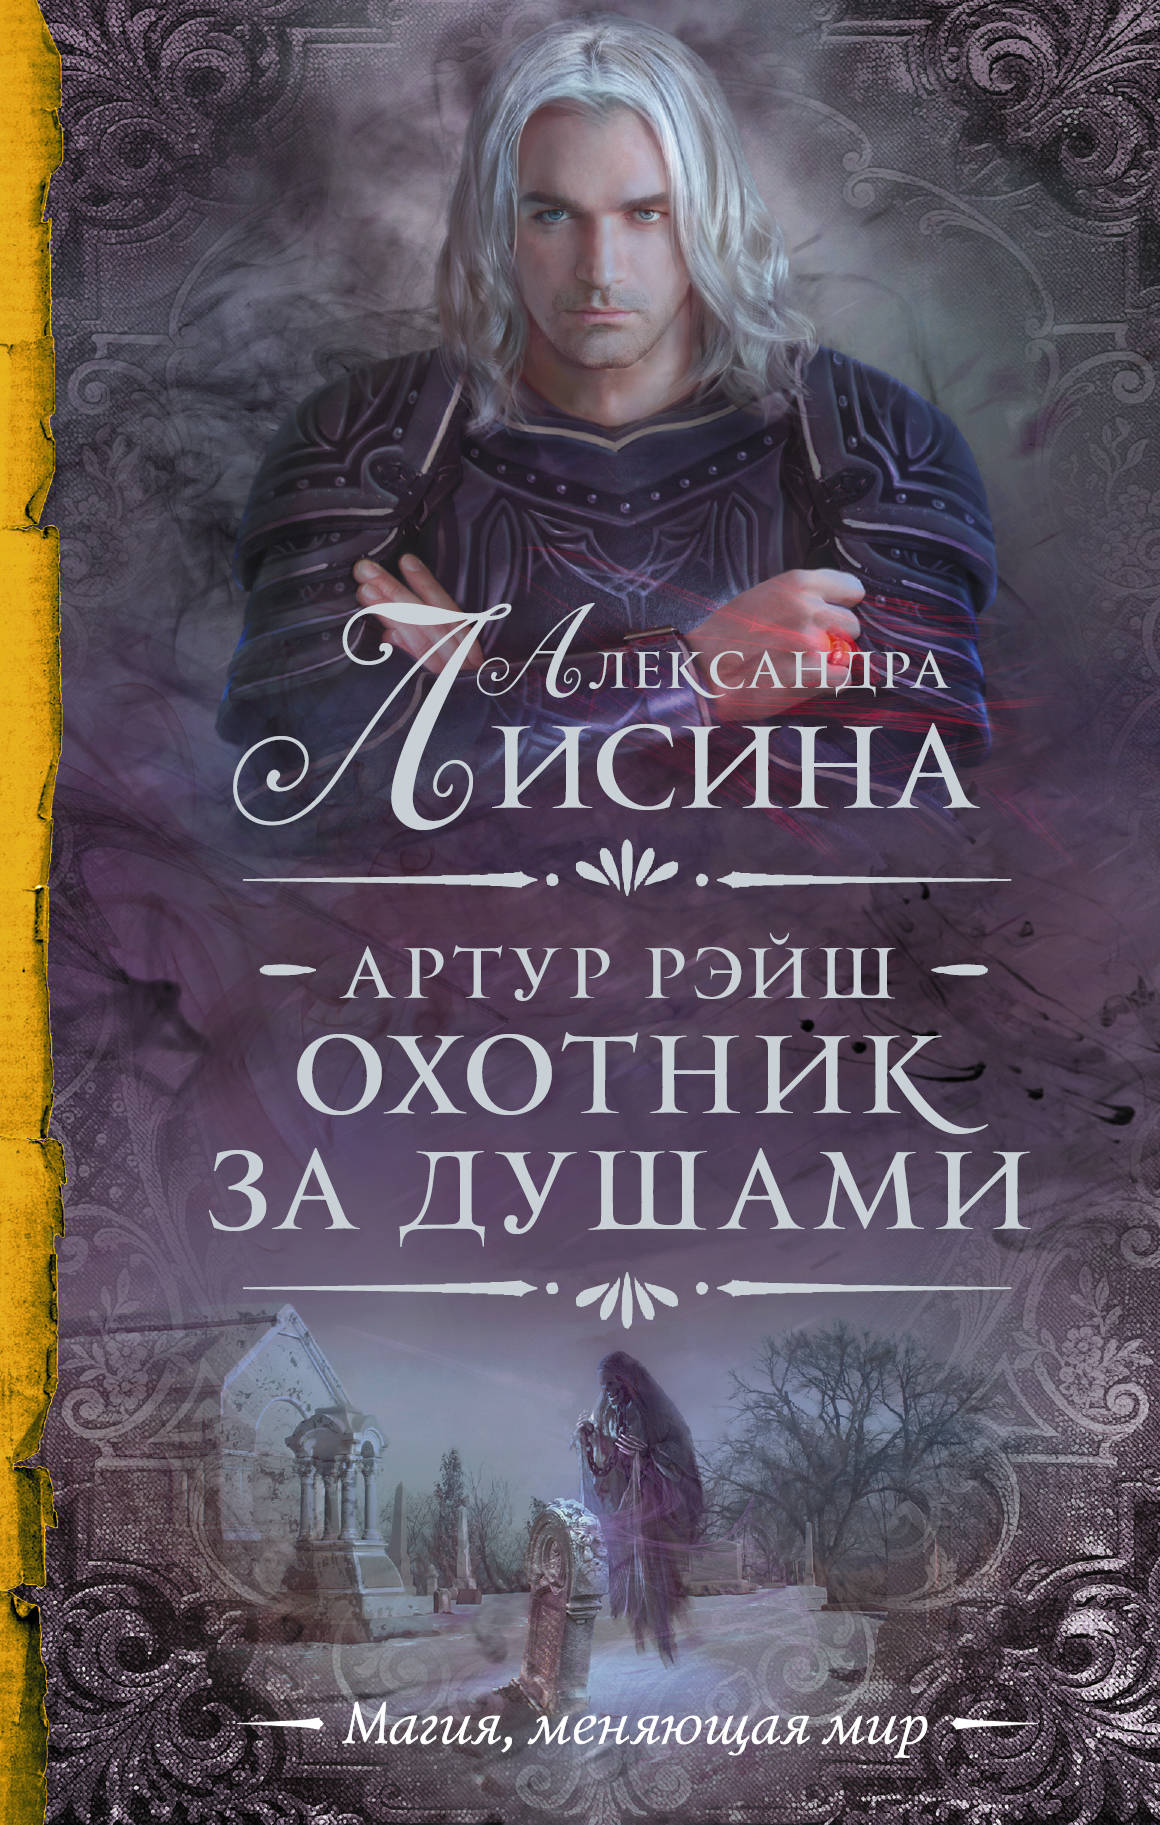 «Артур Рэйш. Охотник за душами (сборник)» Александра Лисина